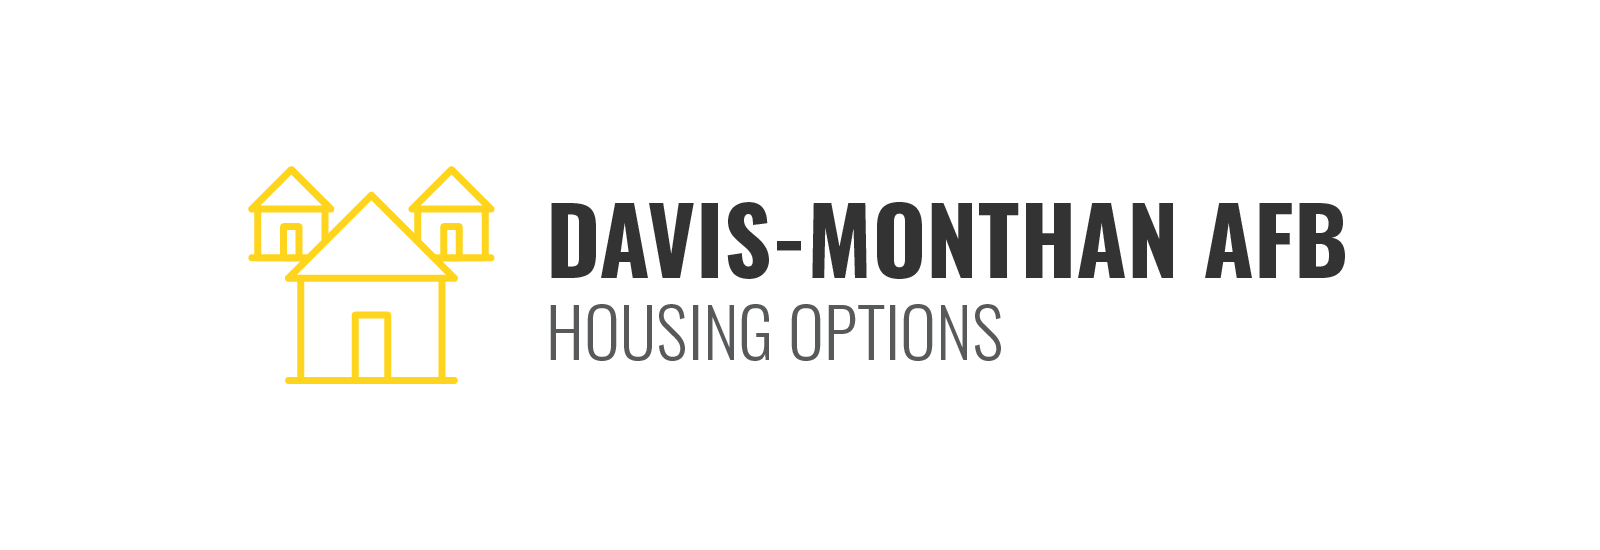 Davis-Monthan AFB Housing Options